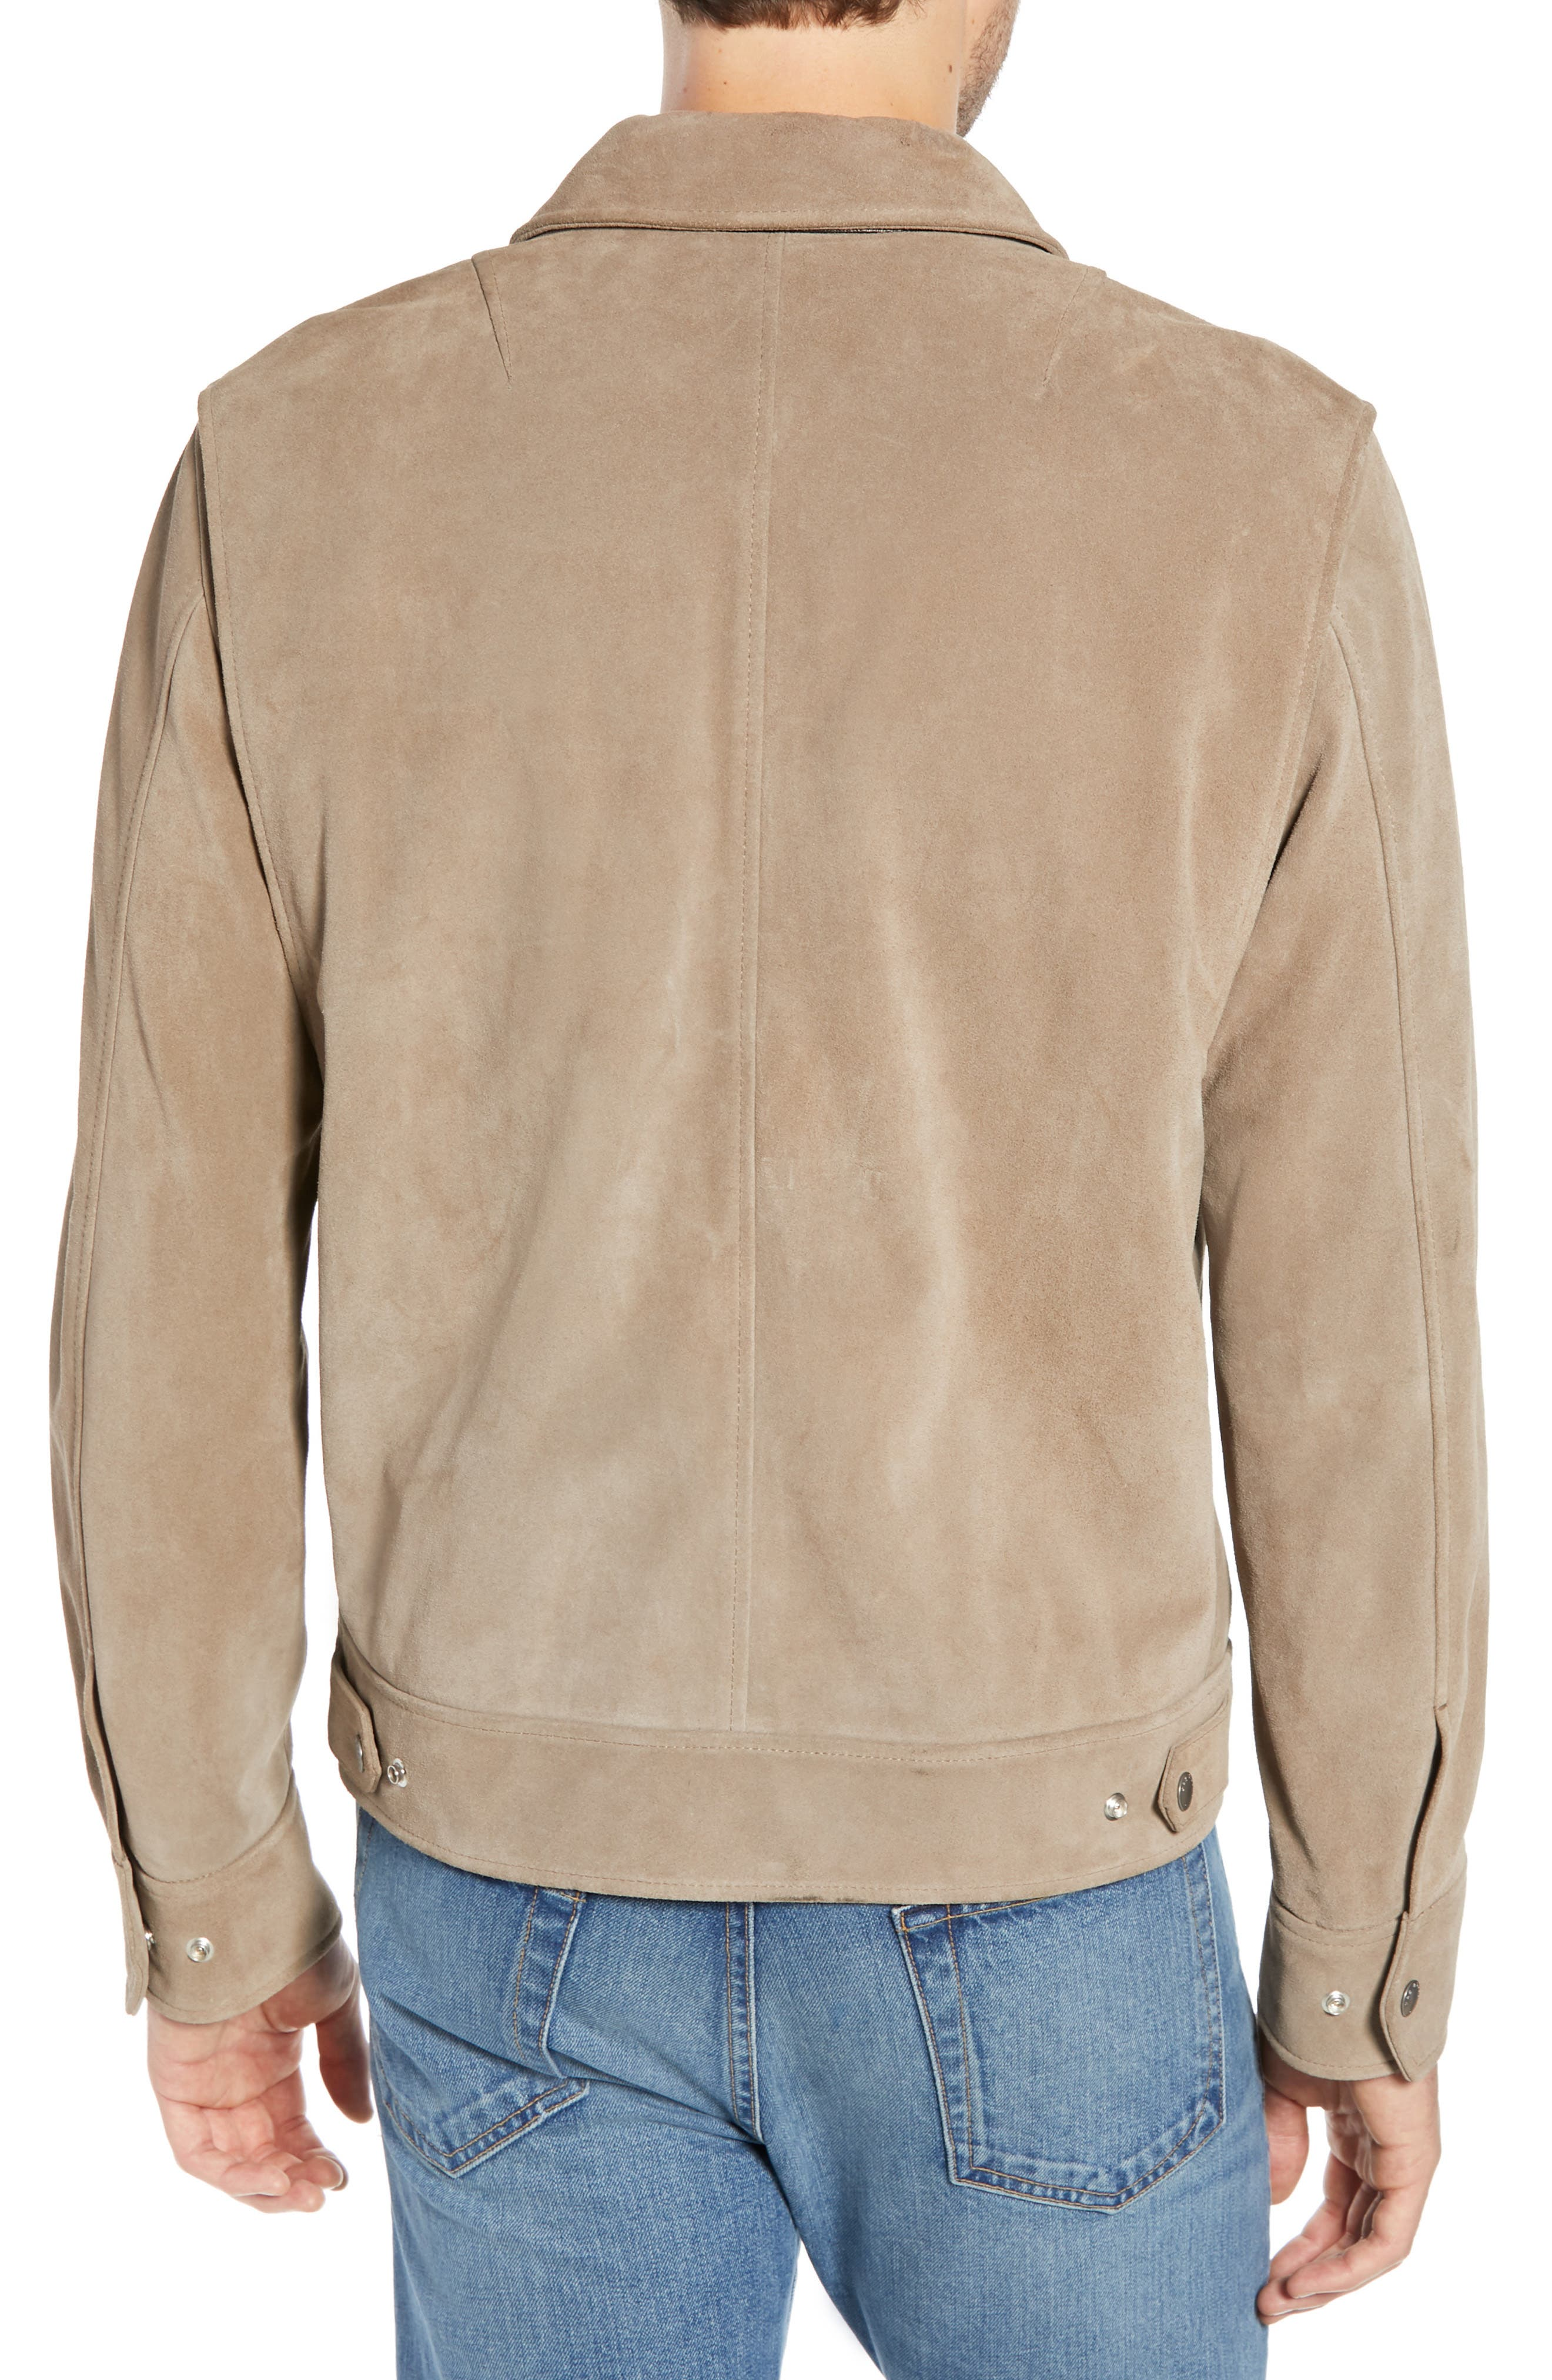 RAG & BONE,                             Regular Fit Suede Garage Jacket,                             Alternate thumbnail 2, color,                             CEMENT